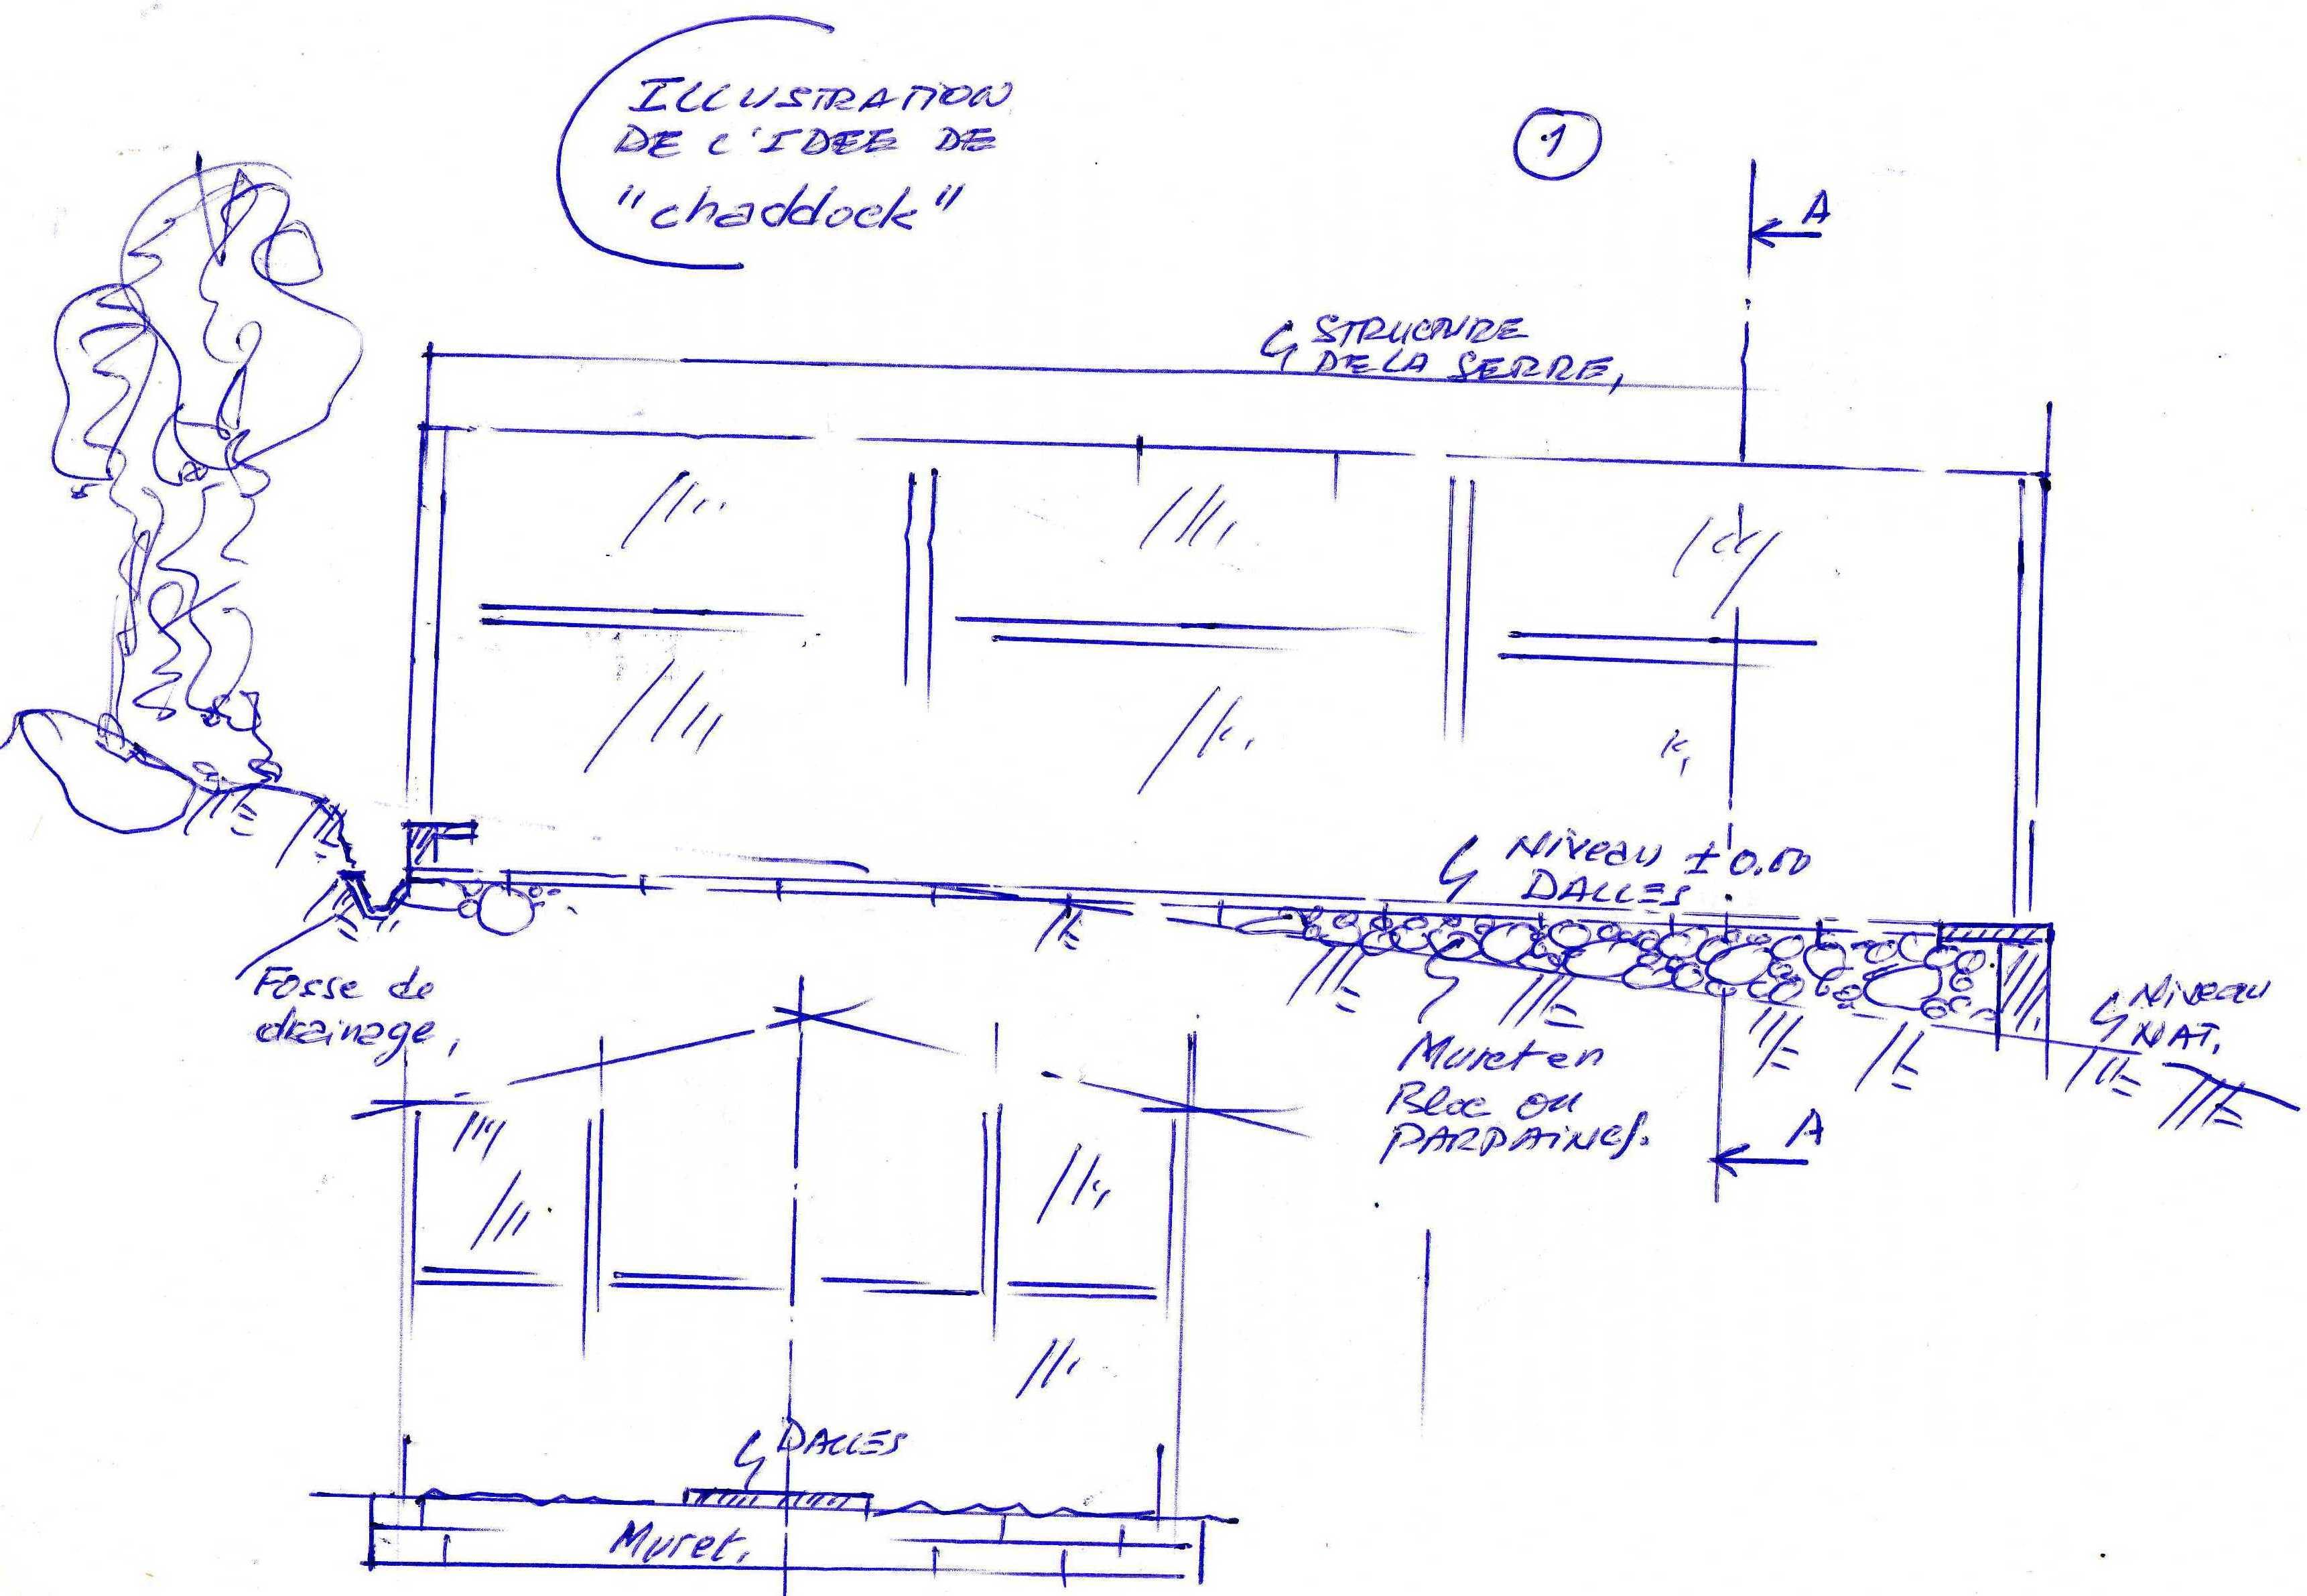 Installer une serre sur terrain en pente - Page 2 - Au jardin, forum ...